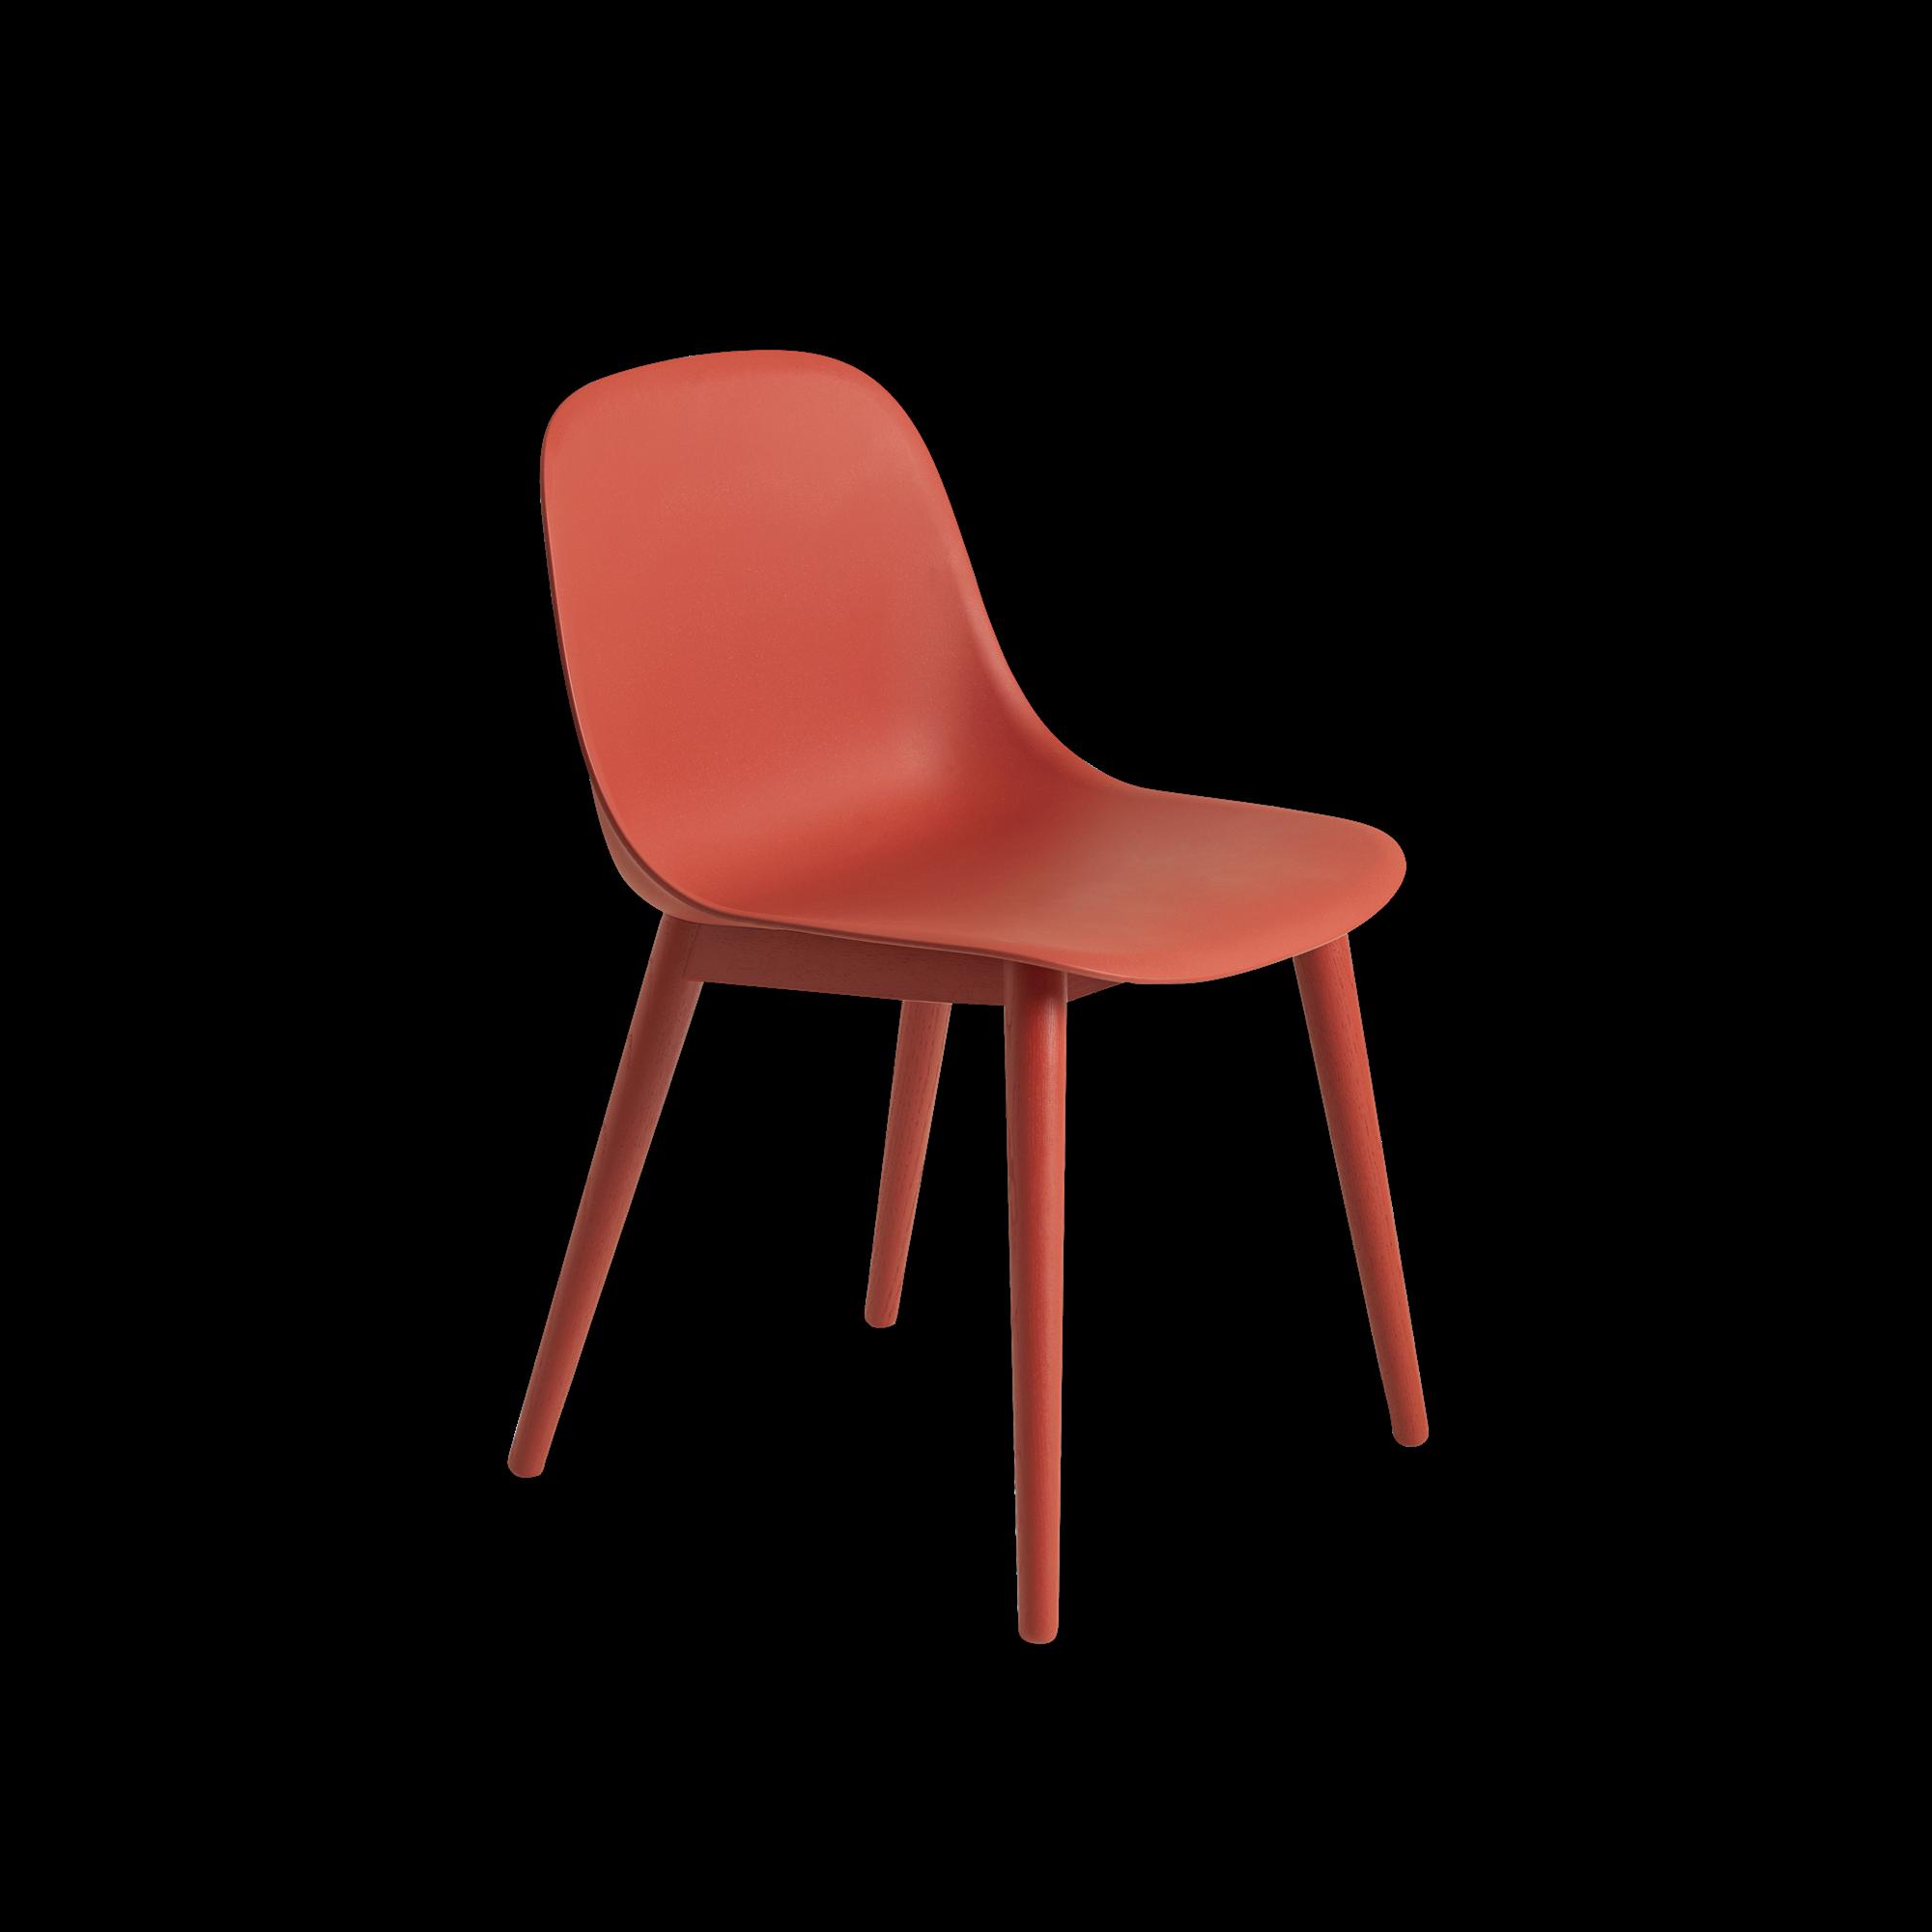 2000x2000 Fiber Side Chair